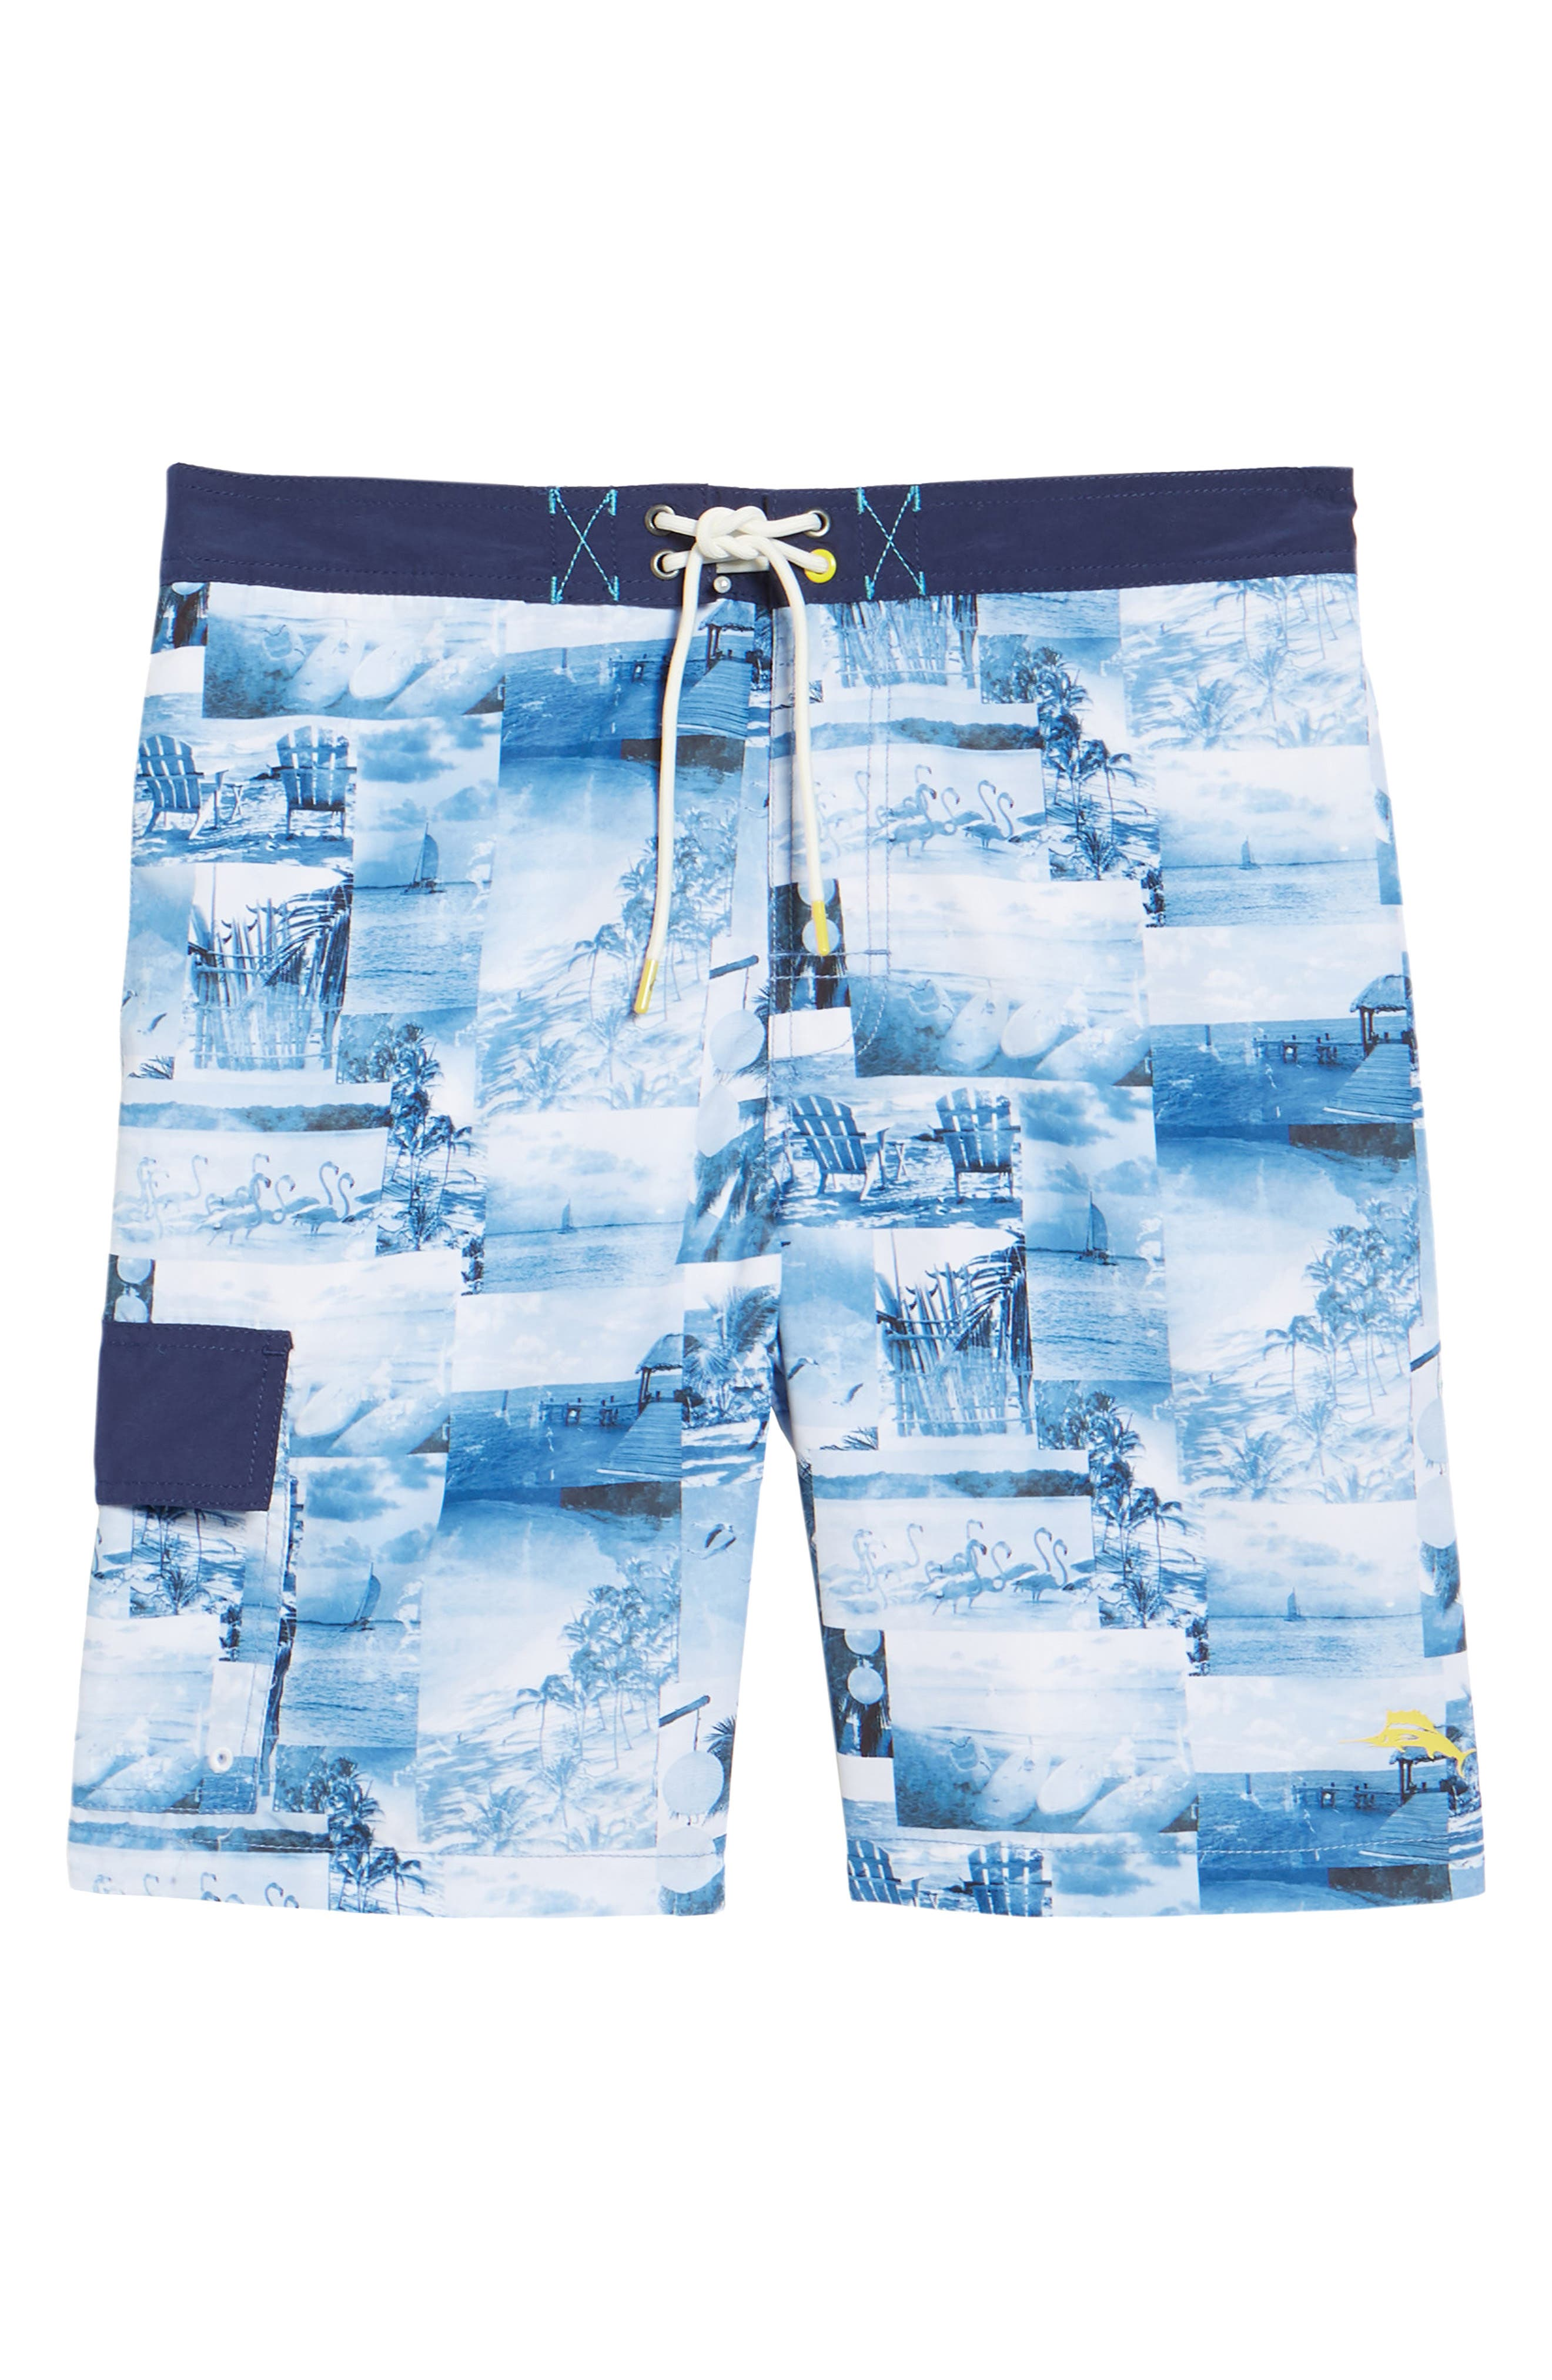 Baja Coast Busters Swim Trunks,                             Alternate thumbnail 6, color,                             Dockside Blue